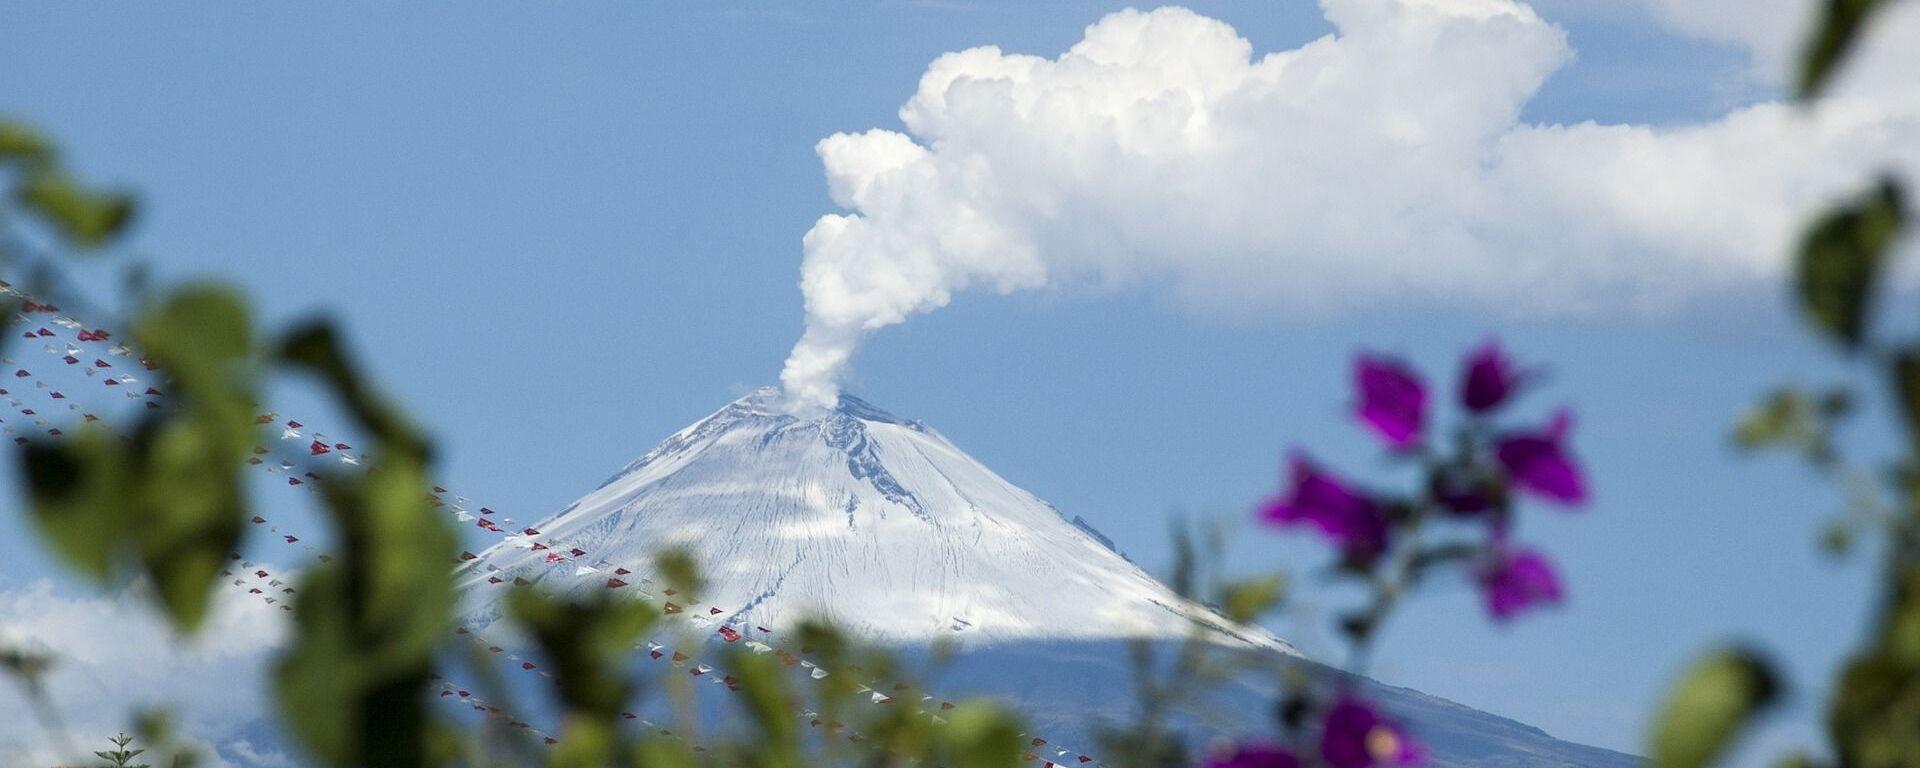 El volcán Popocatépetl, foto de archivo - Sputnik Mundo, 1920, 23.07.2020